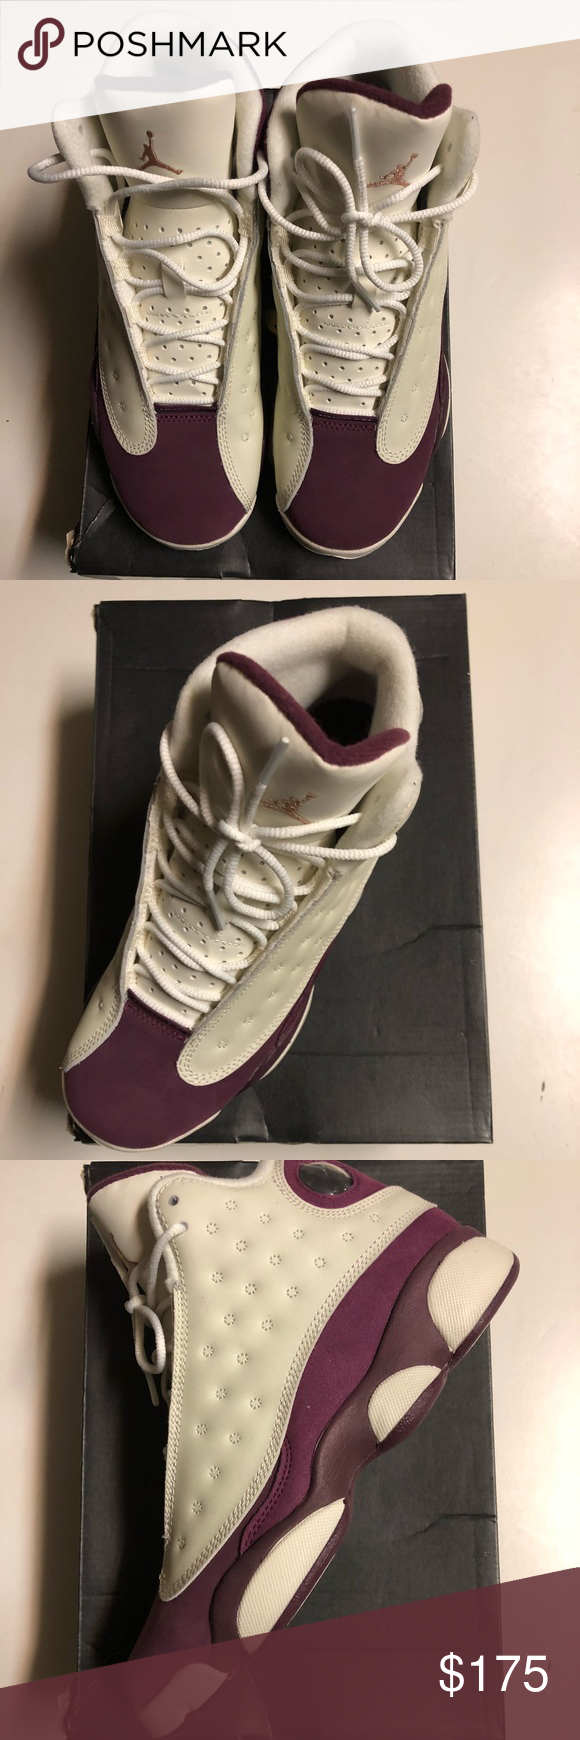 17ca8935d917 Kids Sneaker. Kids Sneaker Brand New SAIL MTLC RED BRONZE-BORDEAUX AIR  JORDAN RETRO 13 GG ...